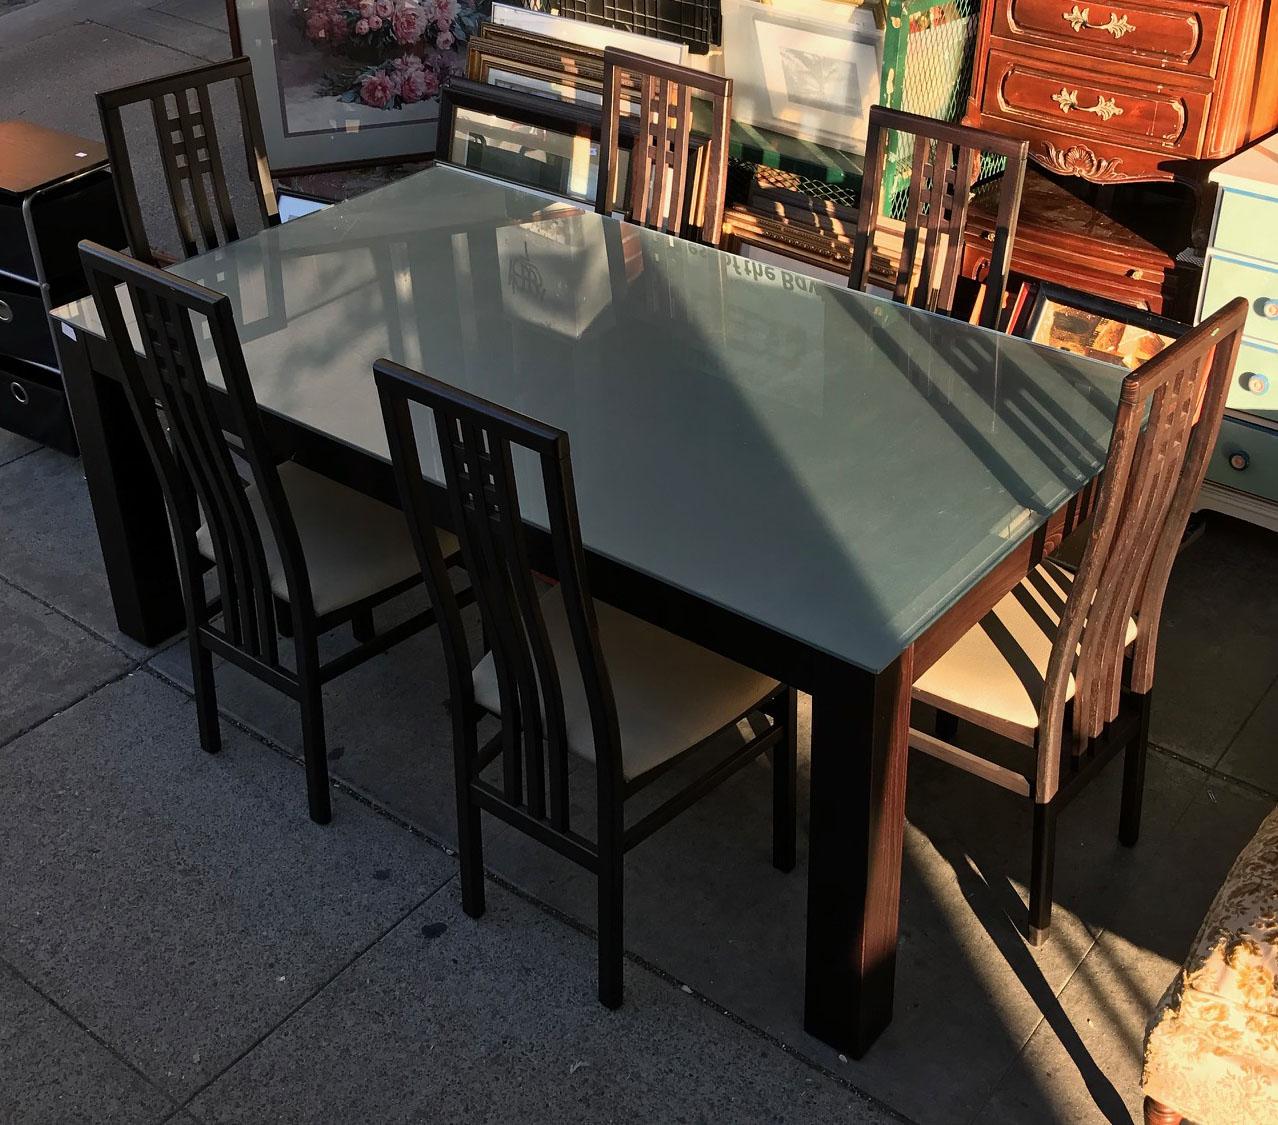 Peachy Uhuru Furniture Collectibles Sold Bargain Buy 23019 Spiritservingveterans Wood Chair Design Ideas Spiritservingveteransorg